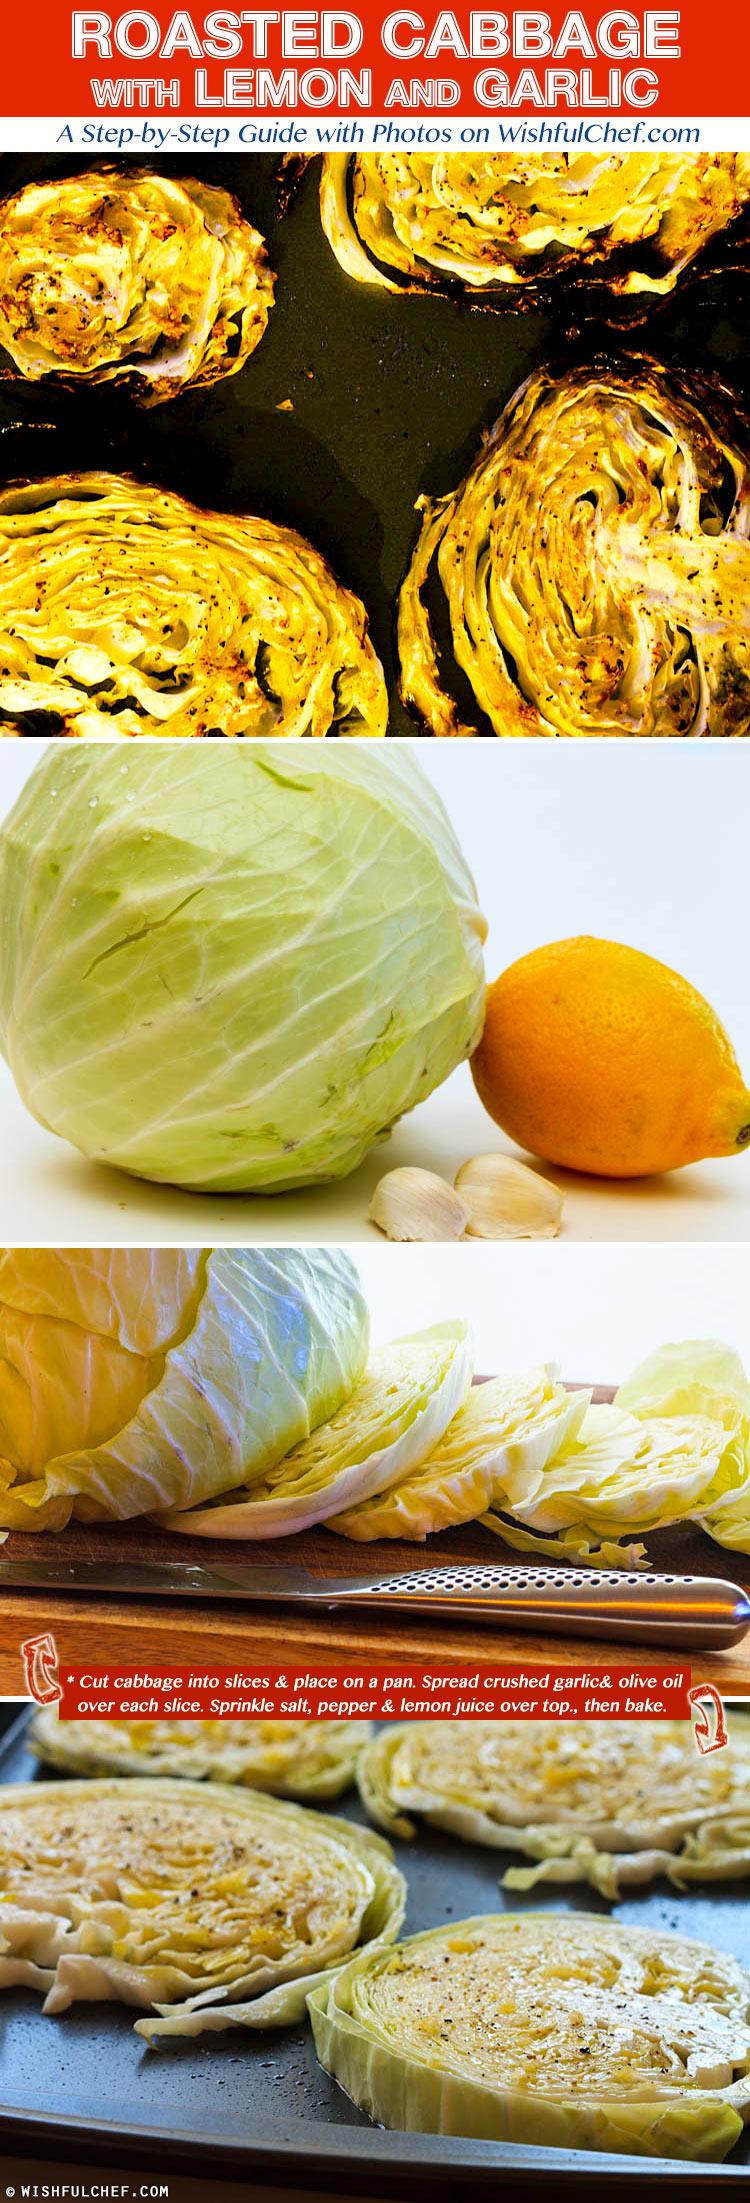 Roast Cabbage